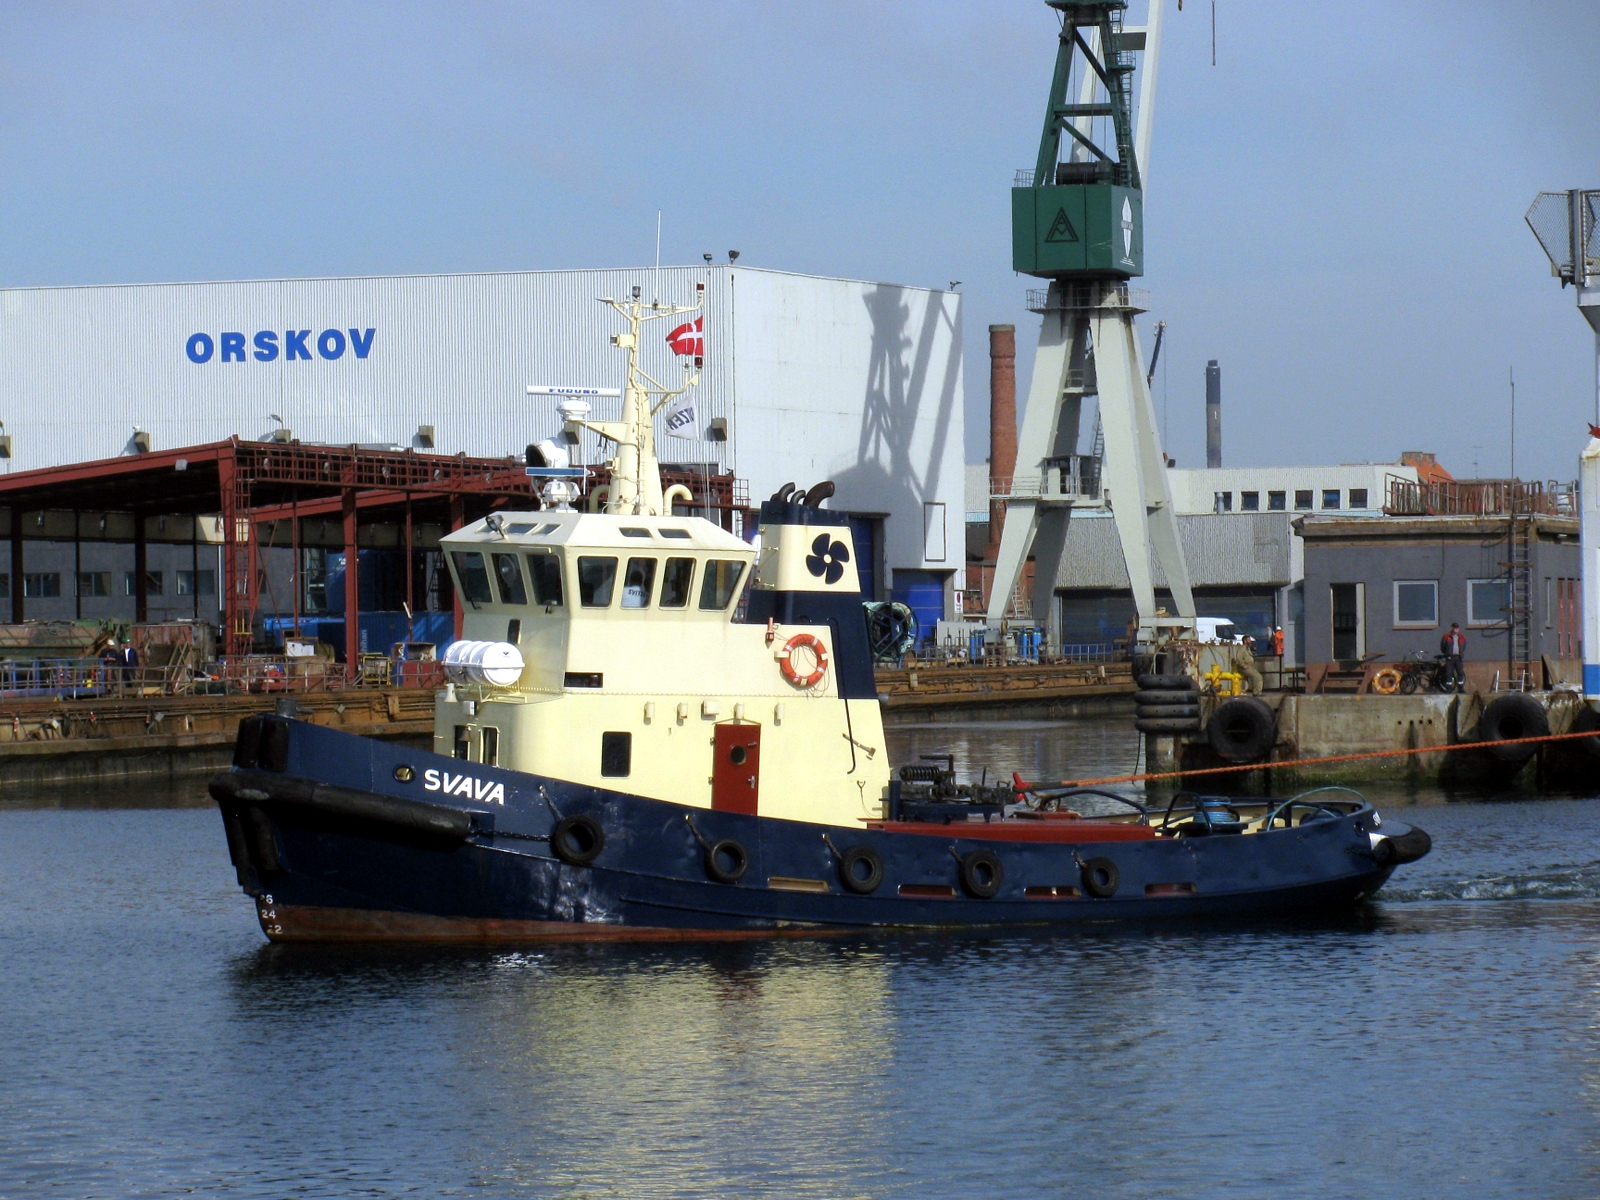 File:Keld Gydum-IMG 2599 tugboat svitzer svava.JPG